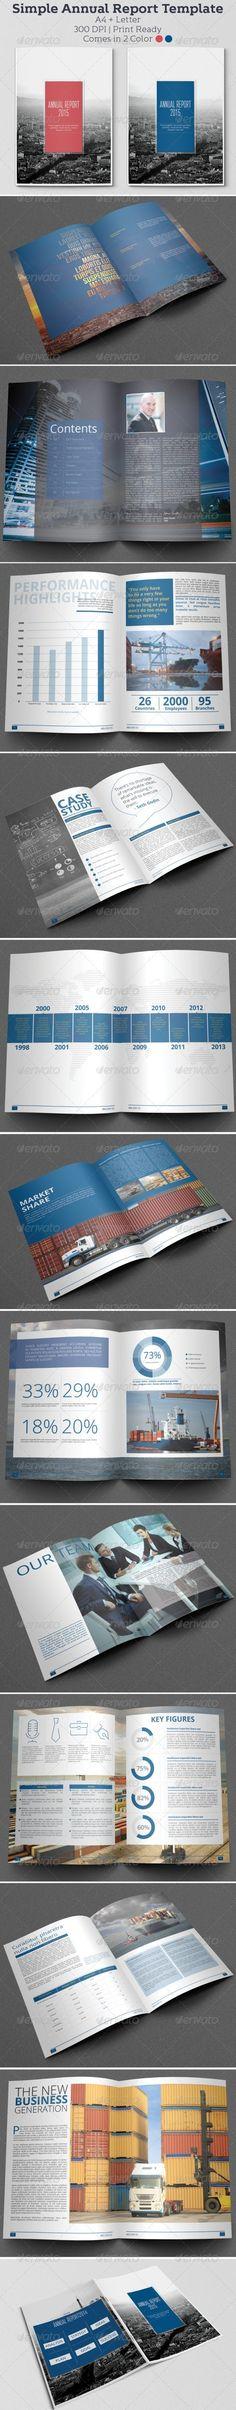 Company Profile Company profile, Landscaping company and - free annual report templates